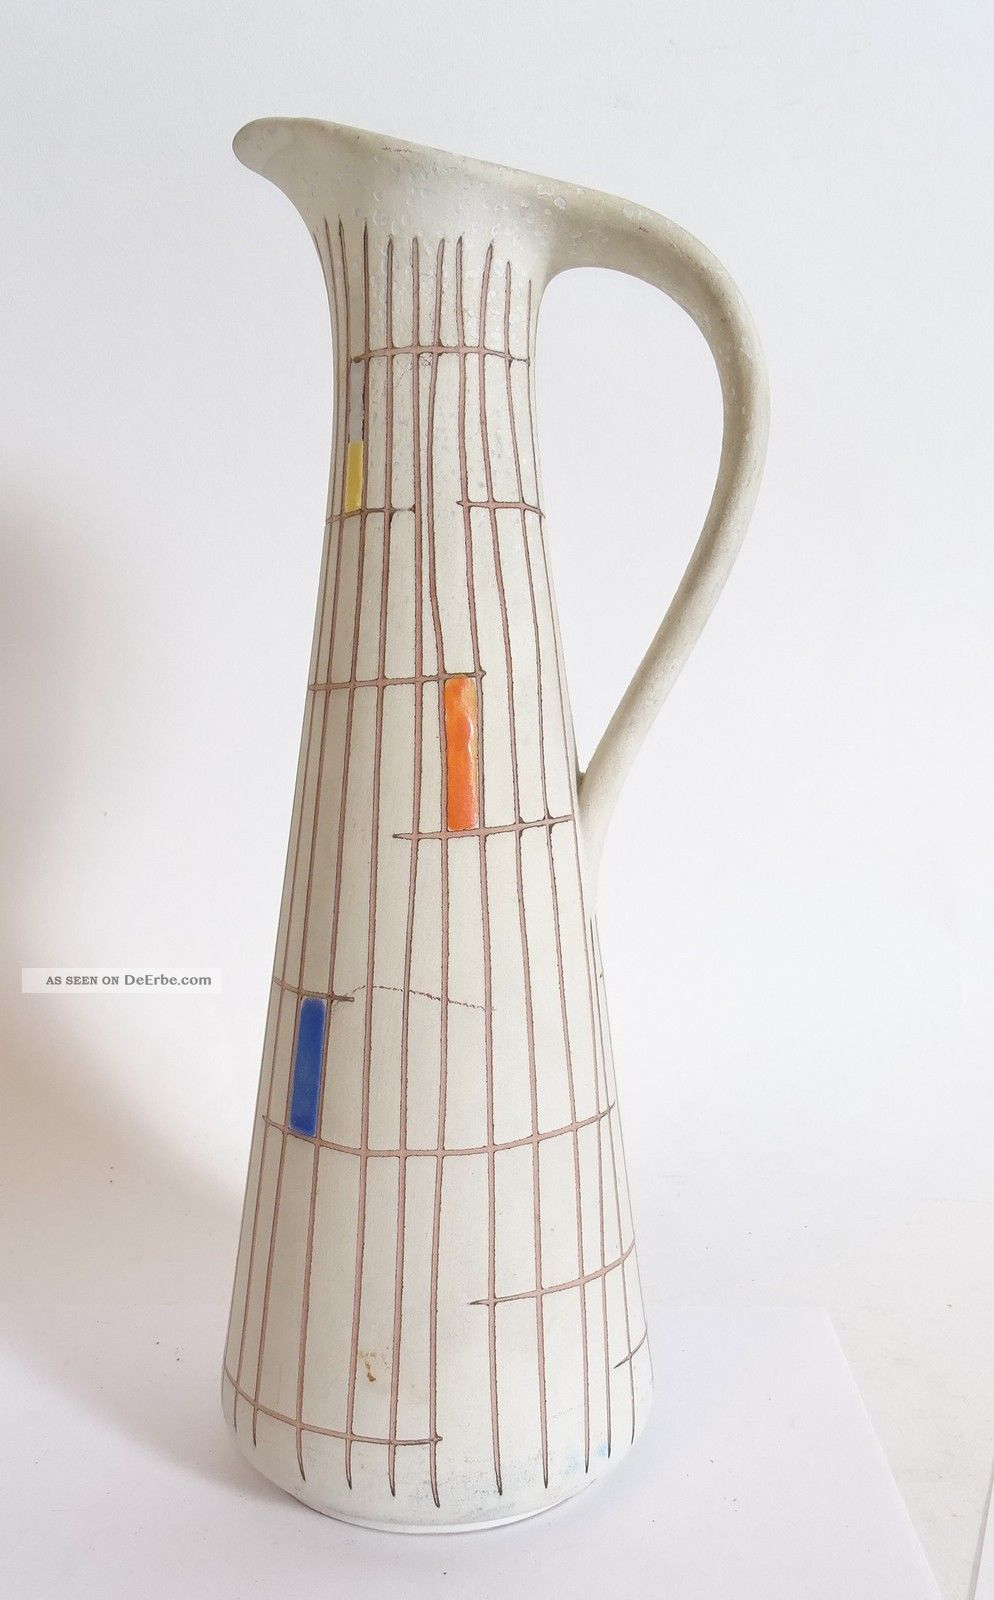 Mid Century 50s 50er Jahre Steuler Keramik Vase Sgraffito Form 4148 1950-1959 Bild